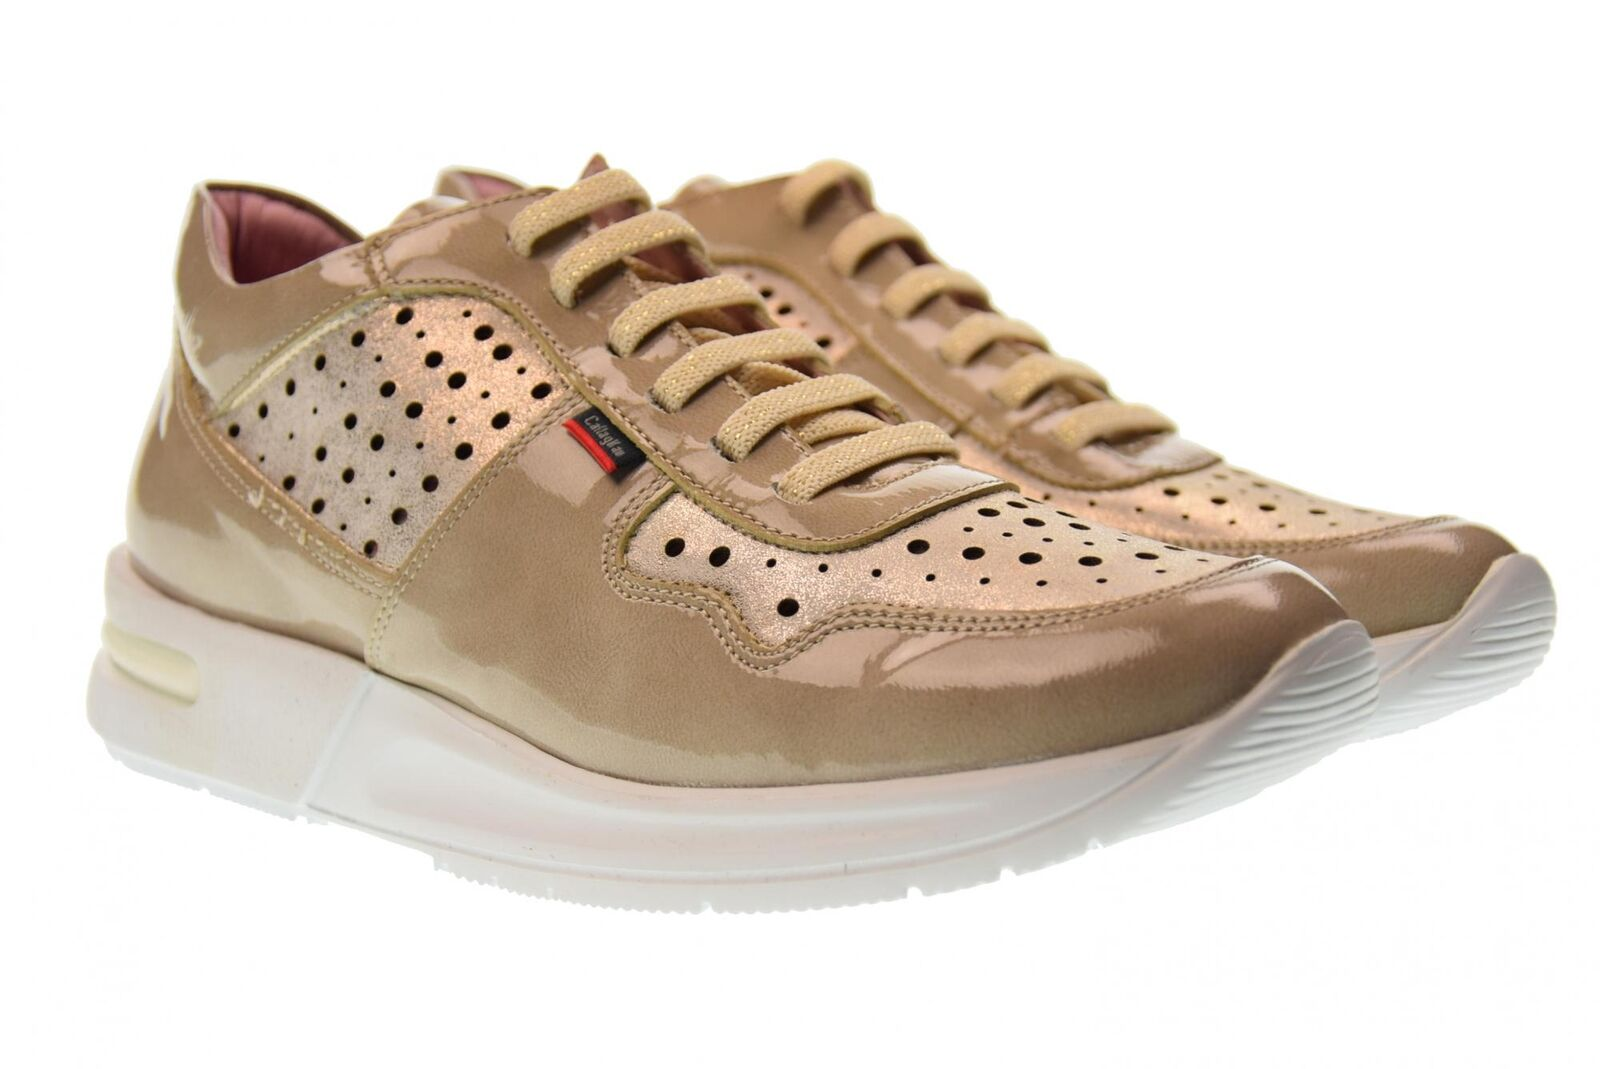 Callaghan kvinnor Low skor skor skor skor med Wedge 92108 p18g  nya märkesvaror